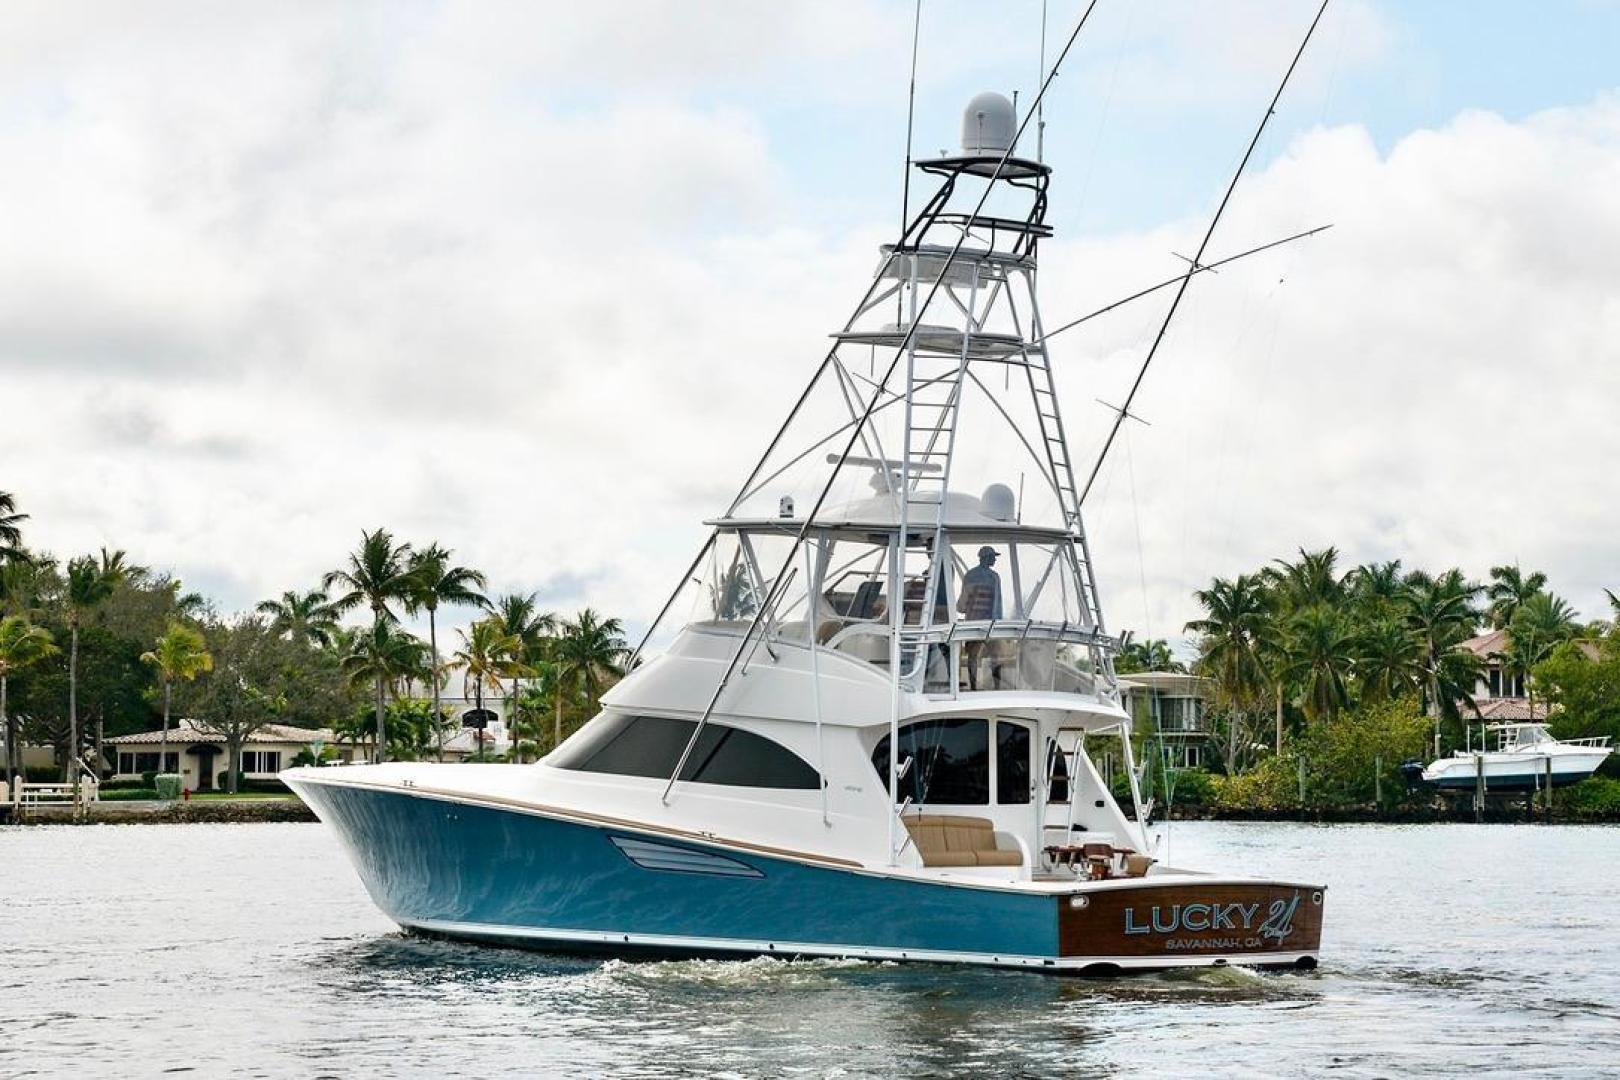 Viking-Convertible 2015-Lucky 24 Too Savannah-Georgia-United States-1538625 | Thumbnail